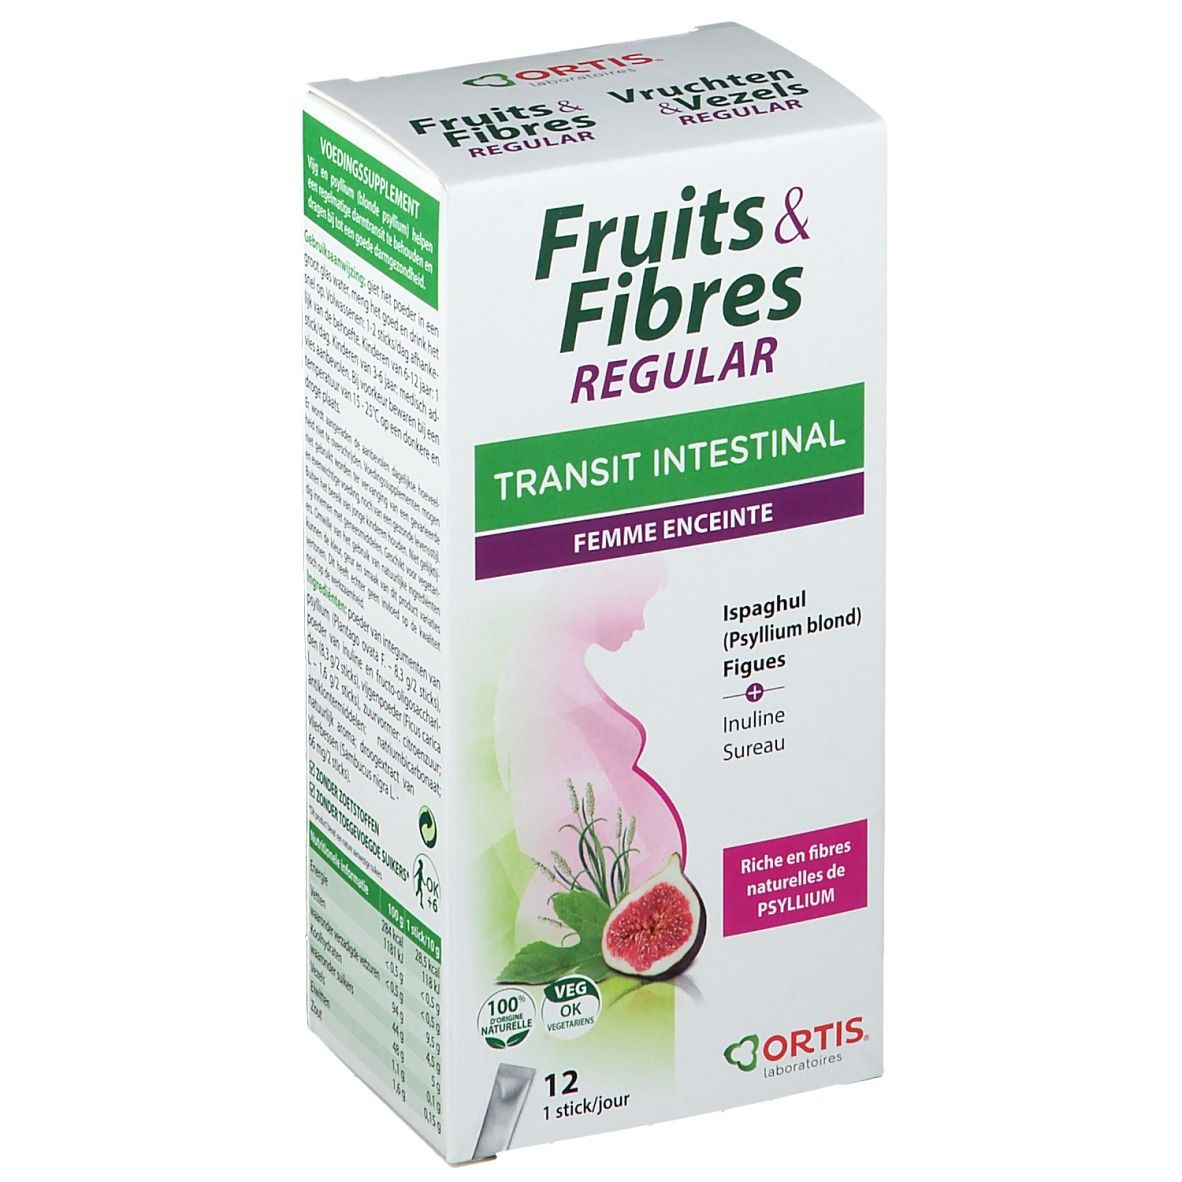 ORTIS® Transit intestinal Fruits & Fibres Regular femme enceinte